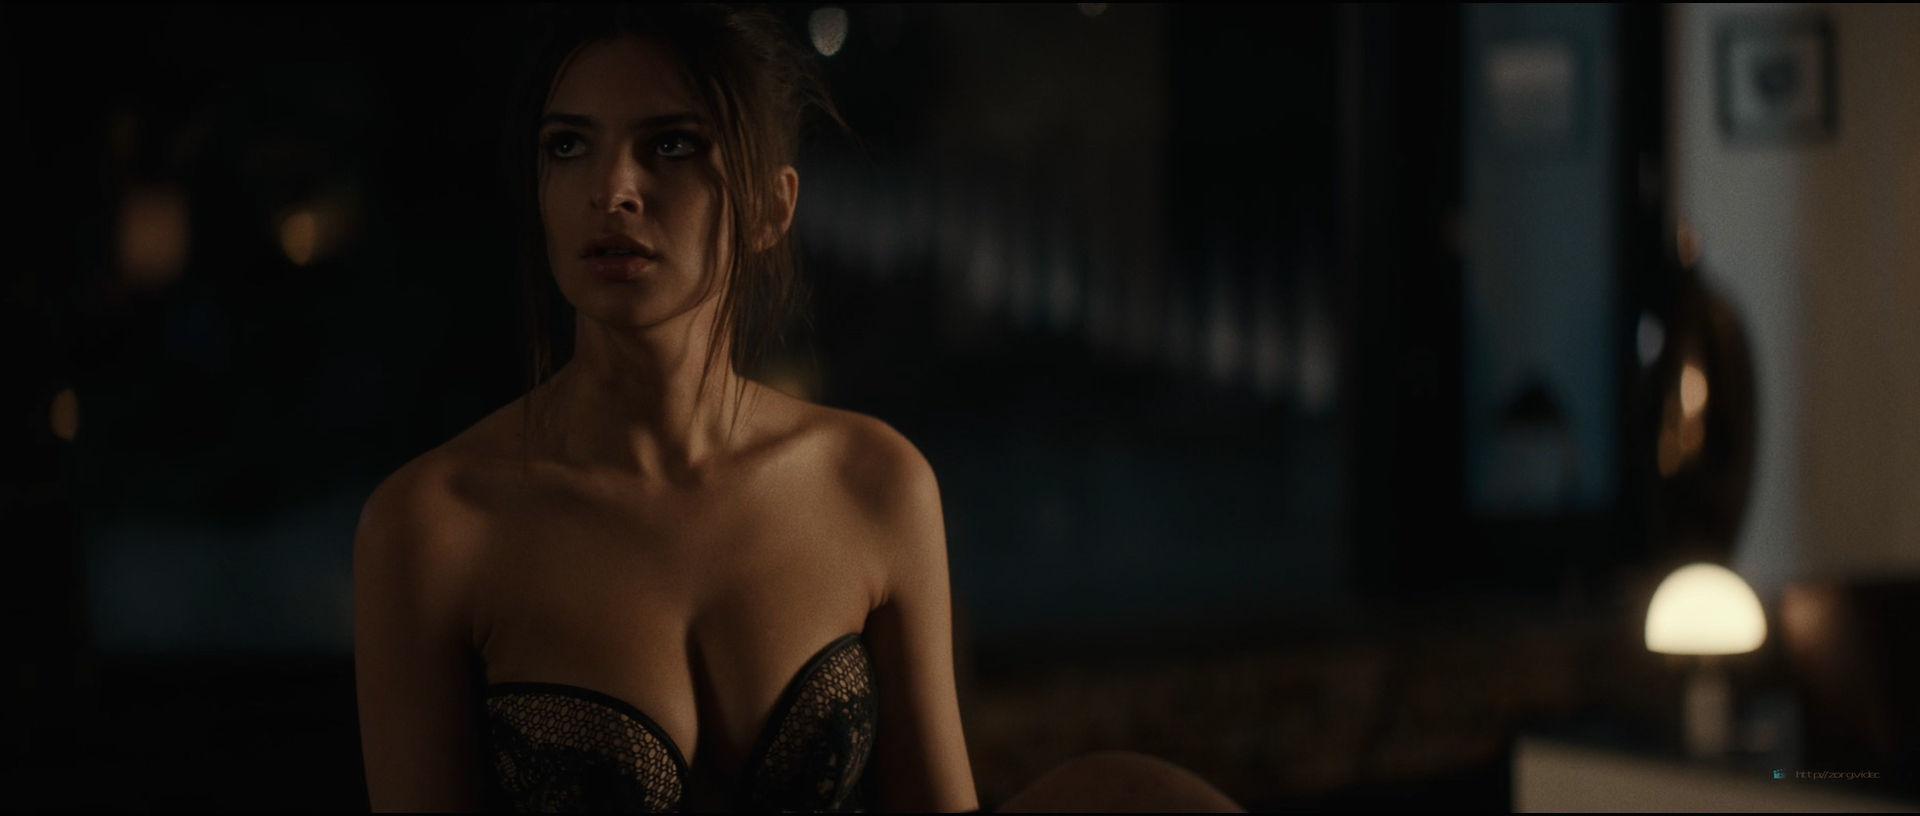 Emily Ratajkowski hot sideboob - Lying and Stealing (2019) 1080p WEB (2)